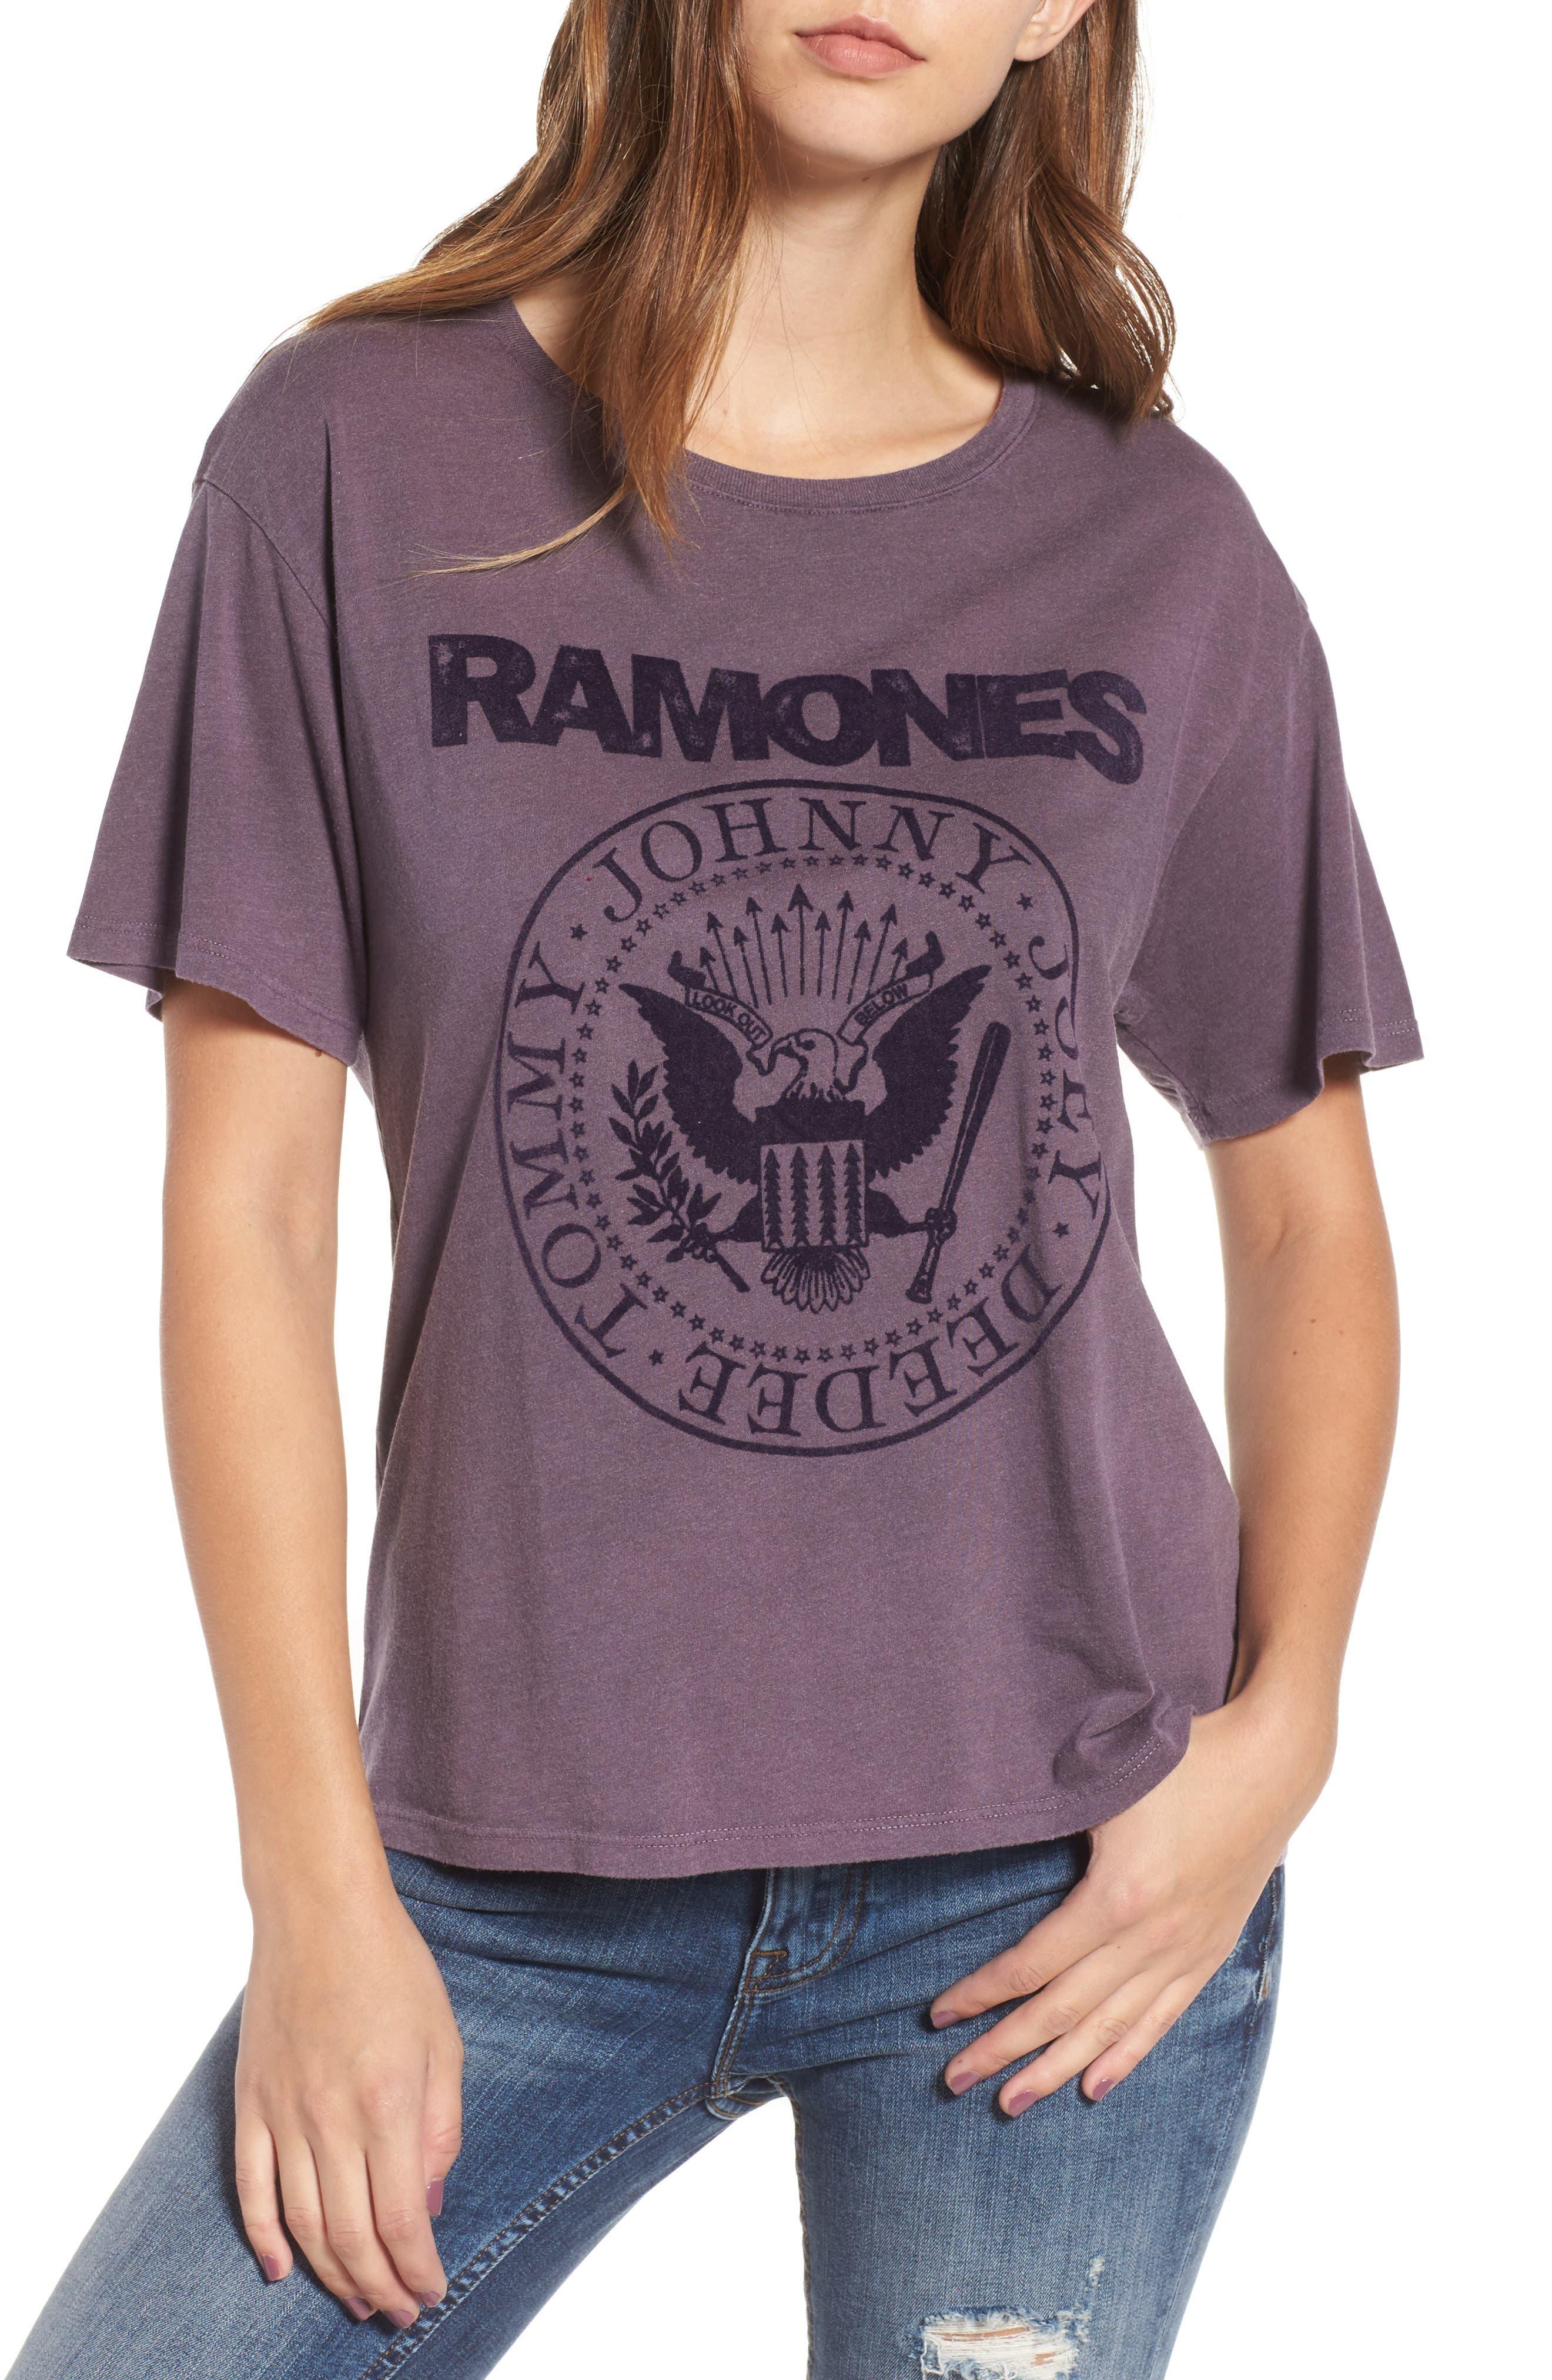 Ramones Tee,                             Main thumbnail 1, color,